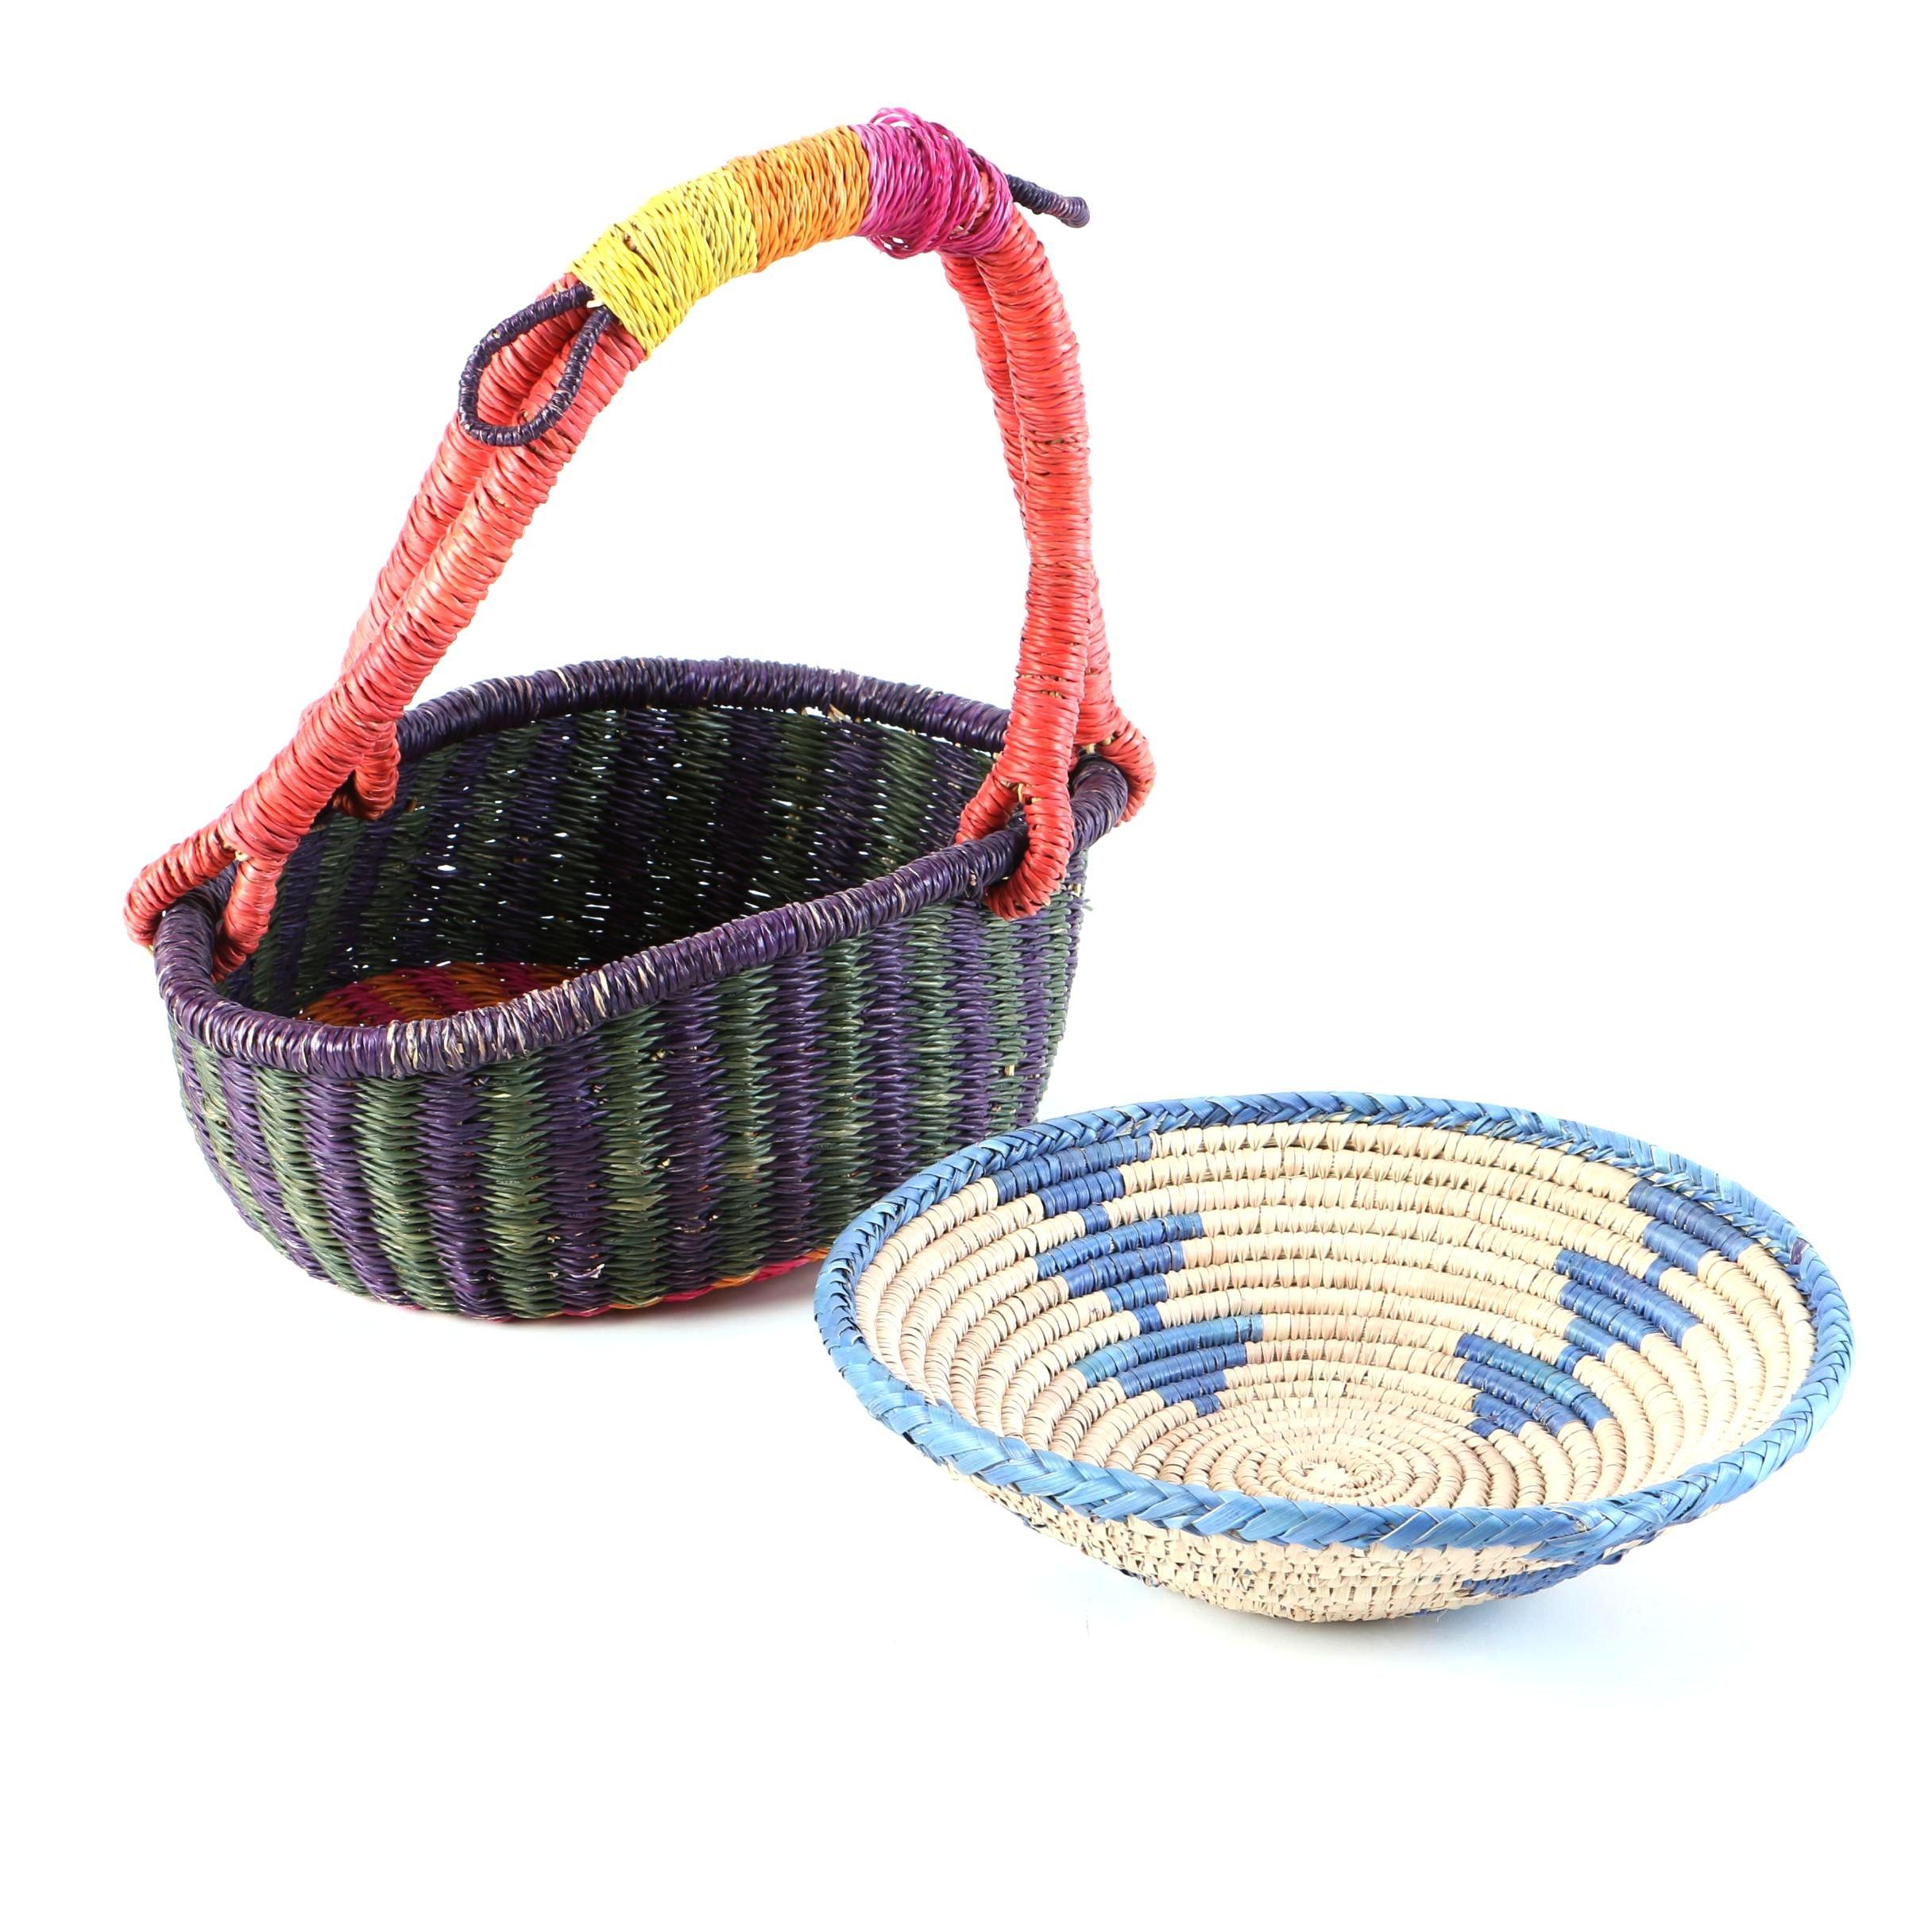 Dyed Woven Grass Baskets